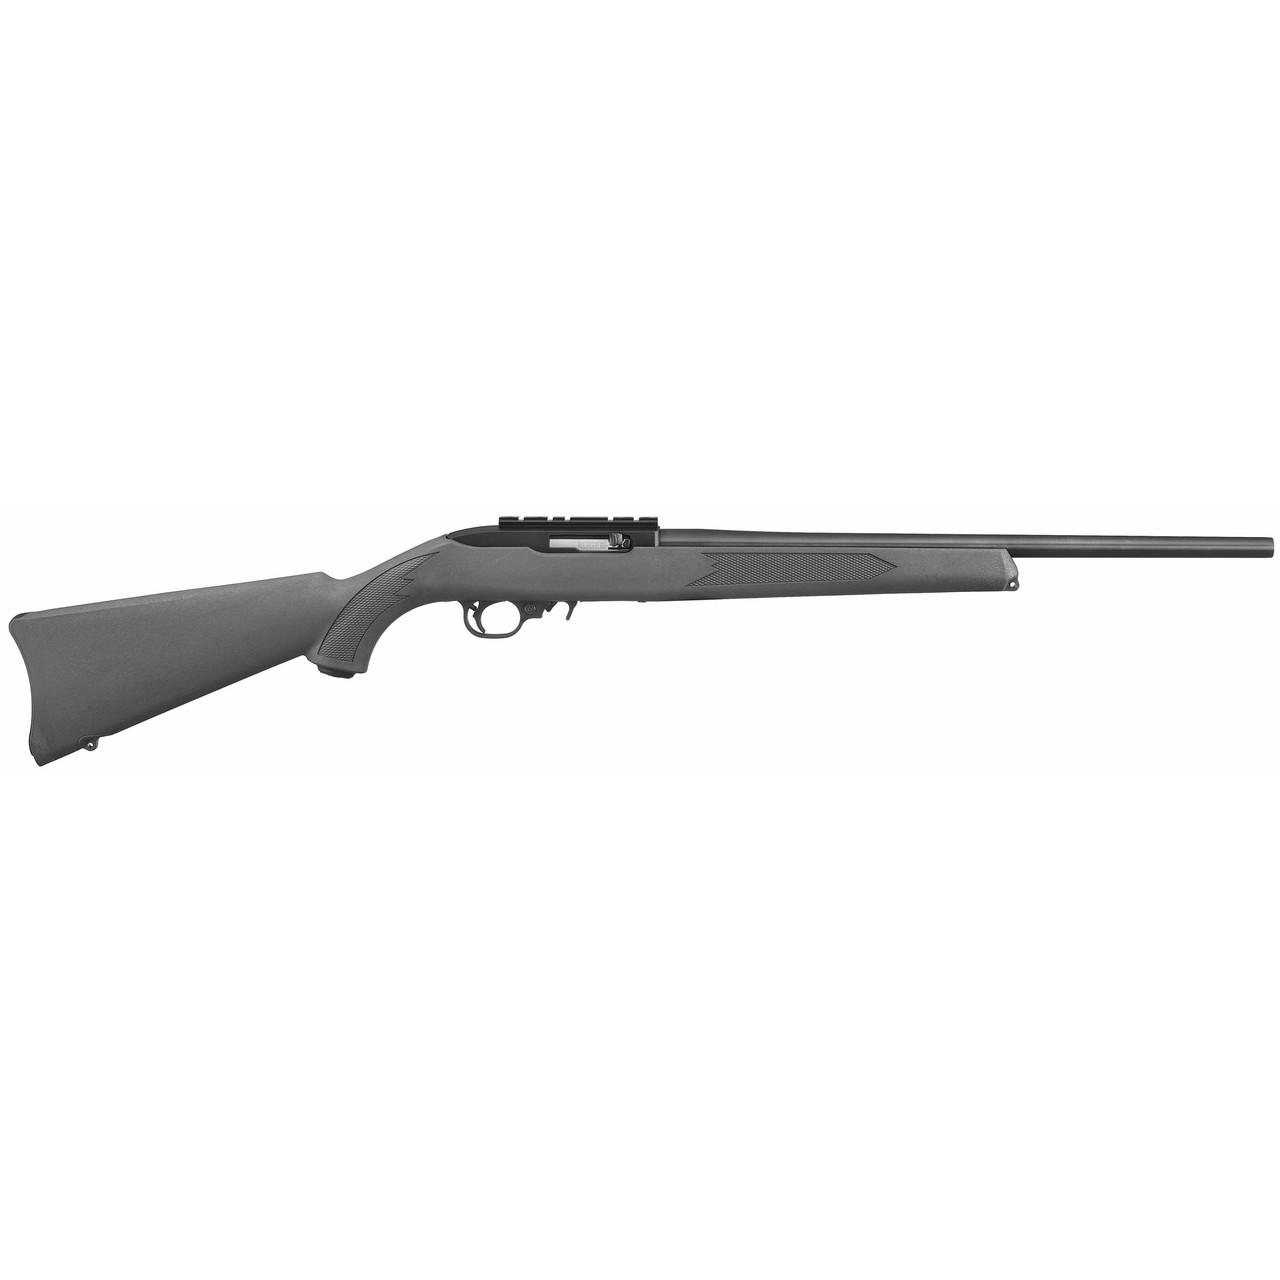 Ruger 10/22 Carbine w/ Scope Base Adapter CALIFORNIA LEGAL - .22 LR